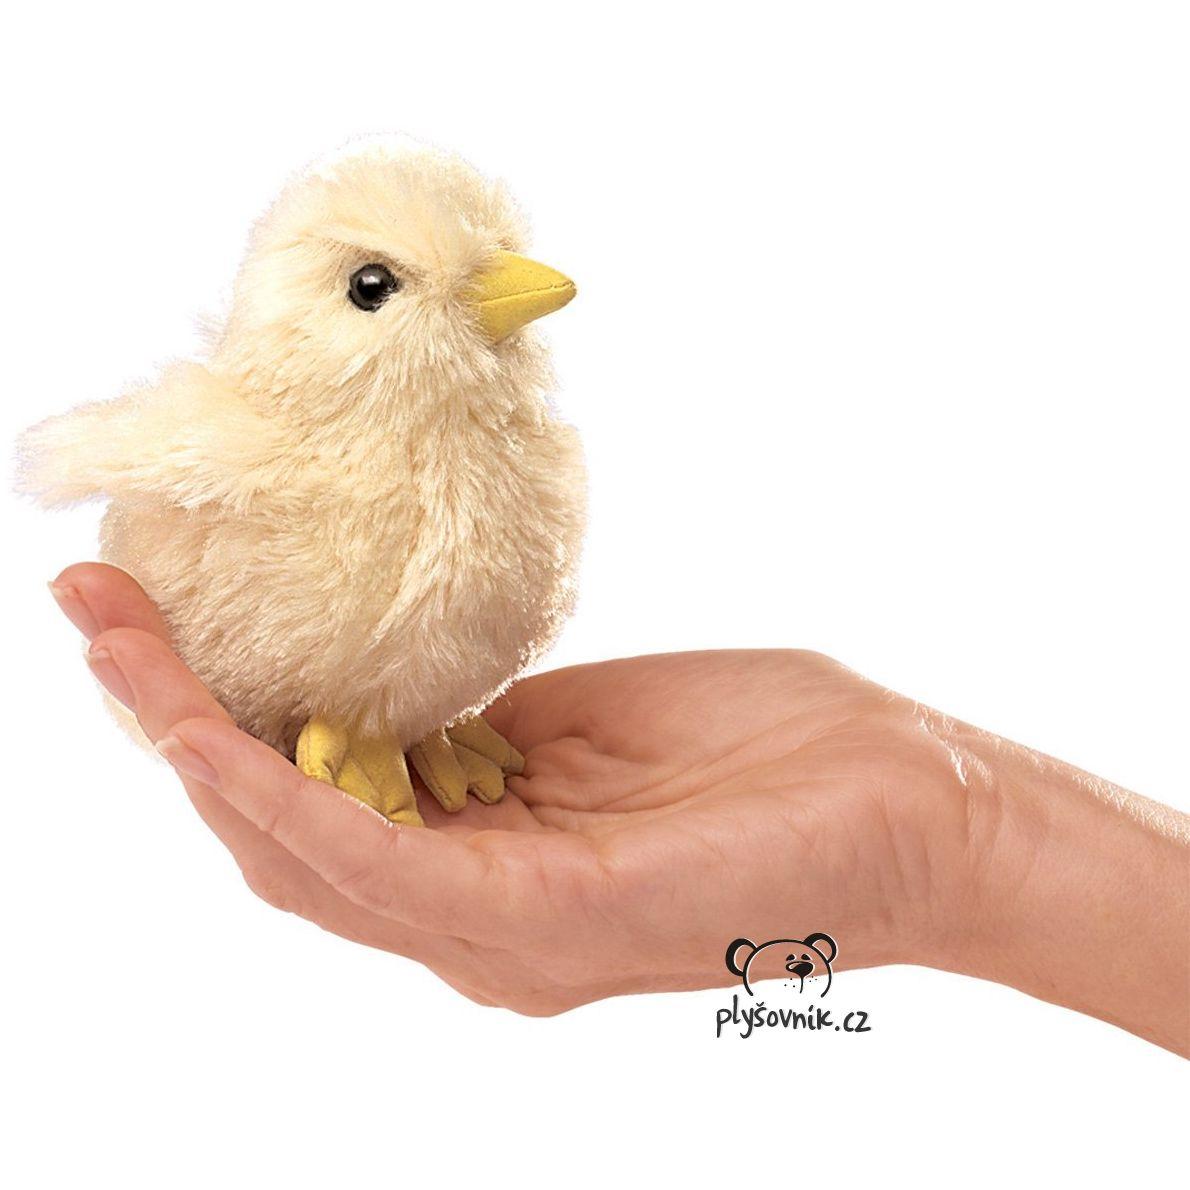 Maňásek na prst kuřátko plyšové 10 × 7,5 × 7,5cm Folkmanis | skladem